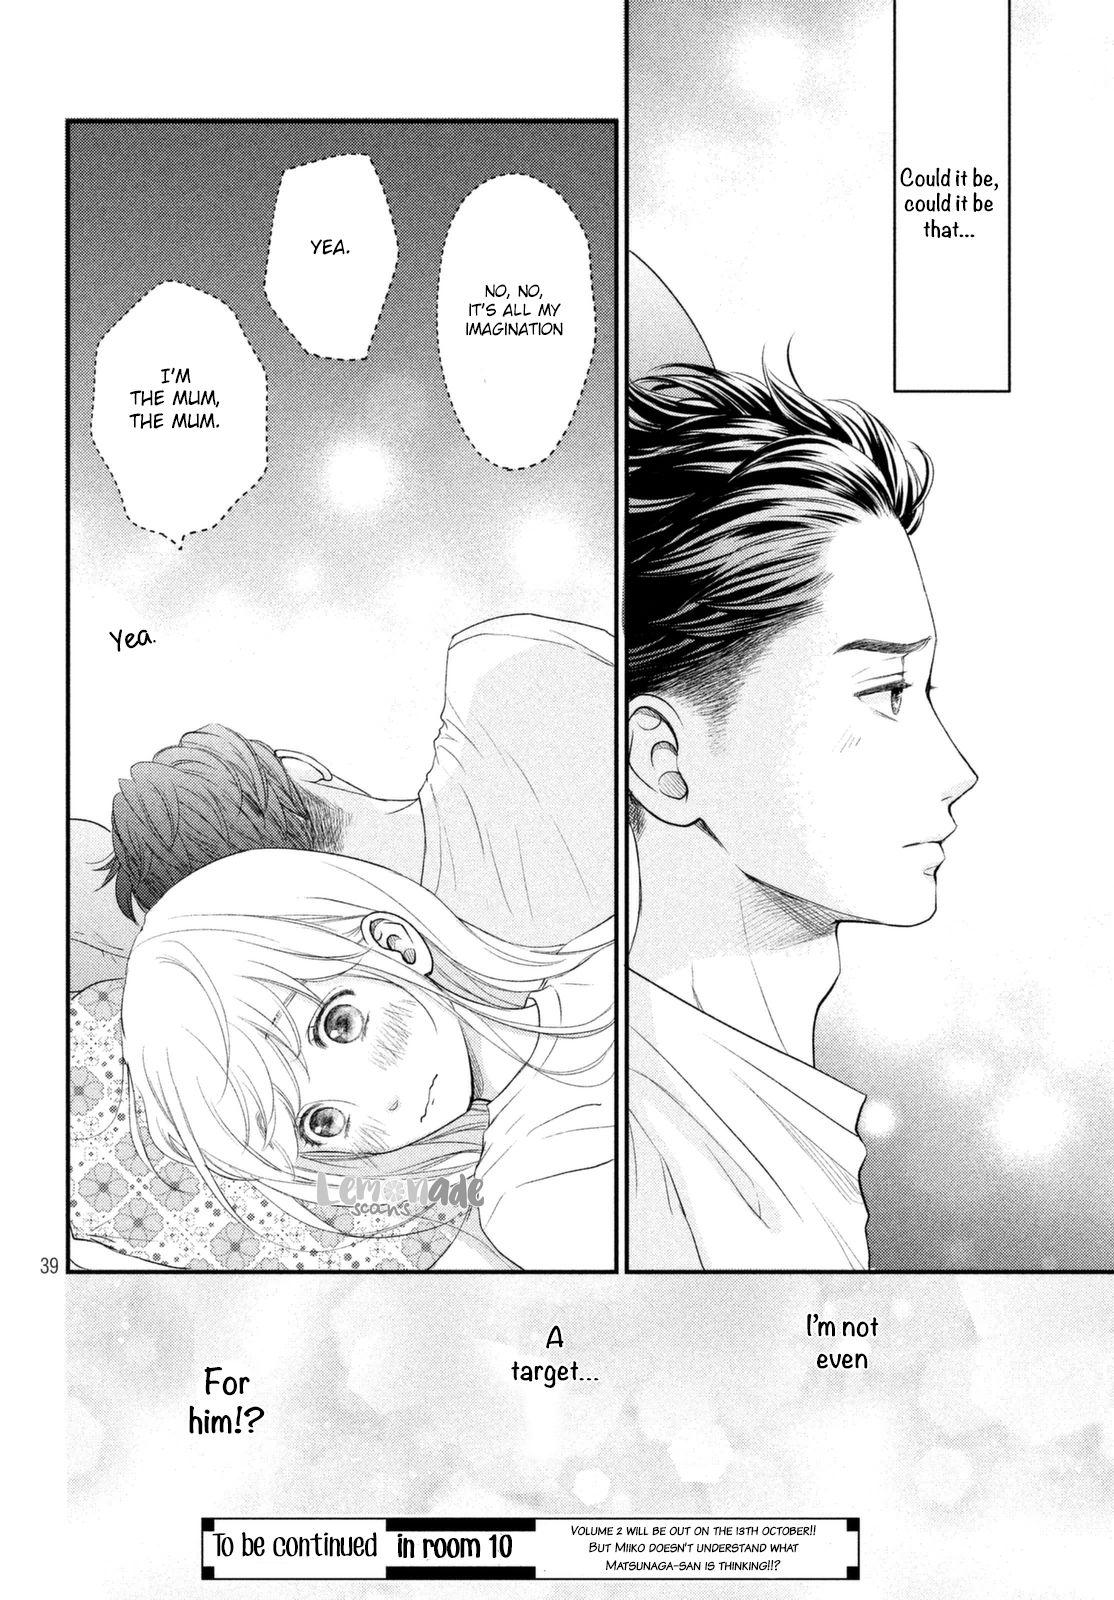 Living No Matsunaga San Vol 3 Ch 9 Stream 2 Edition 1 Page All Mangapark Read Online For Free In 2020 San Manga Read Online For Free